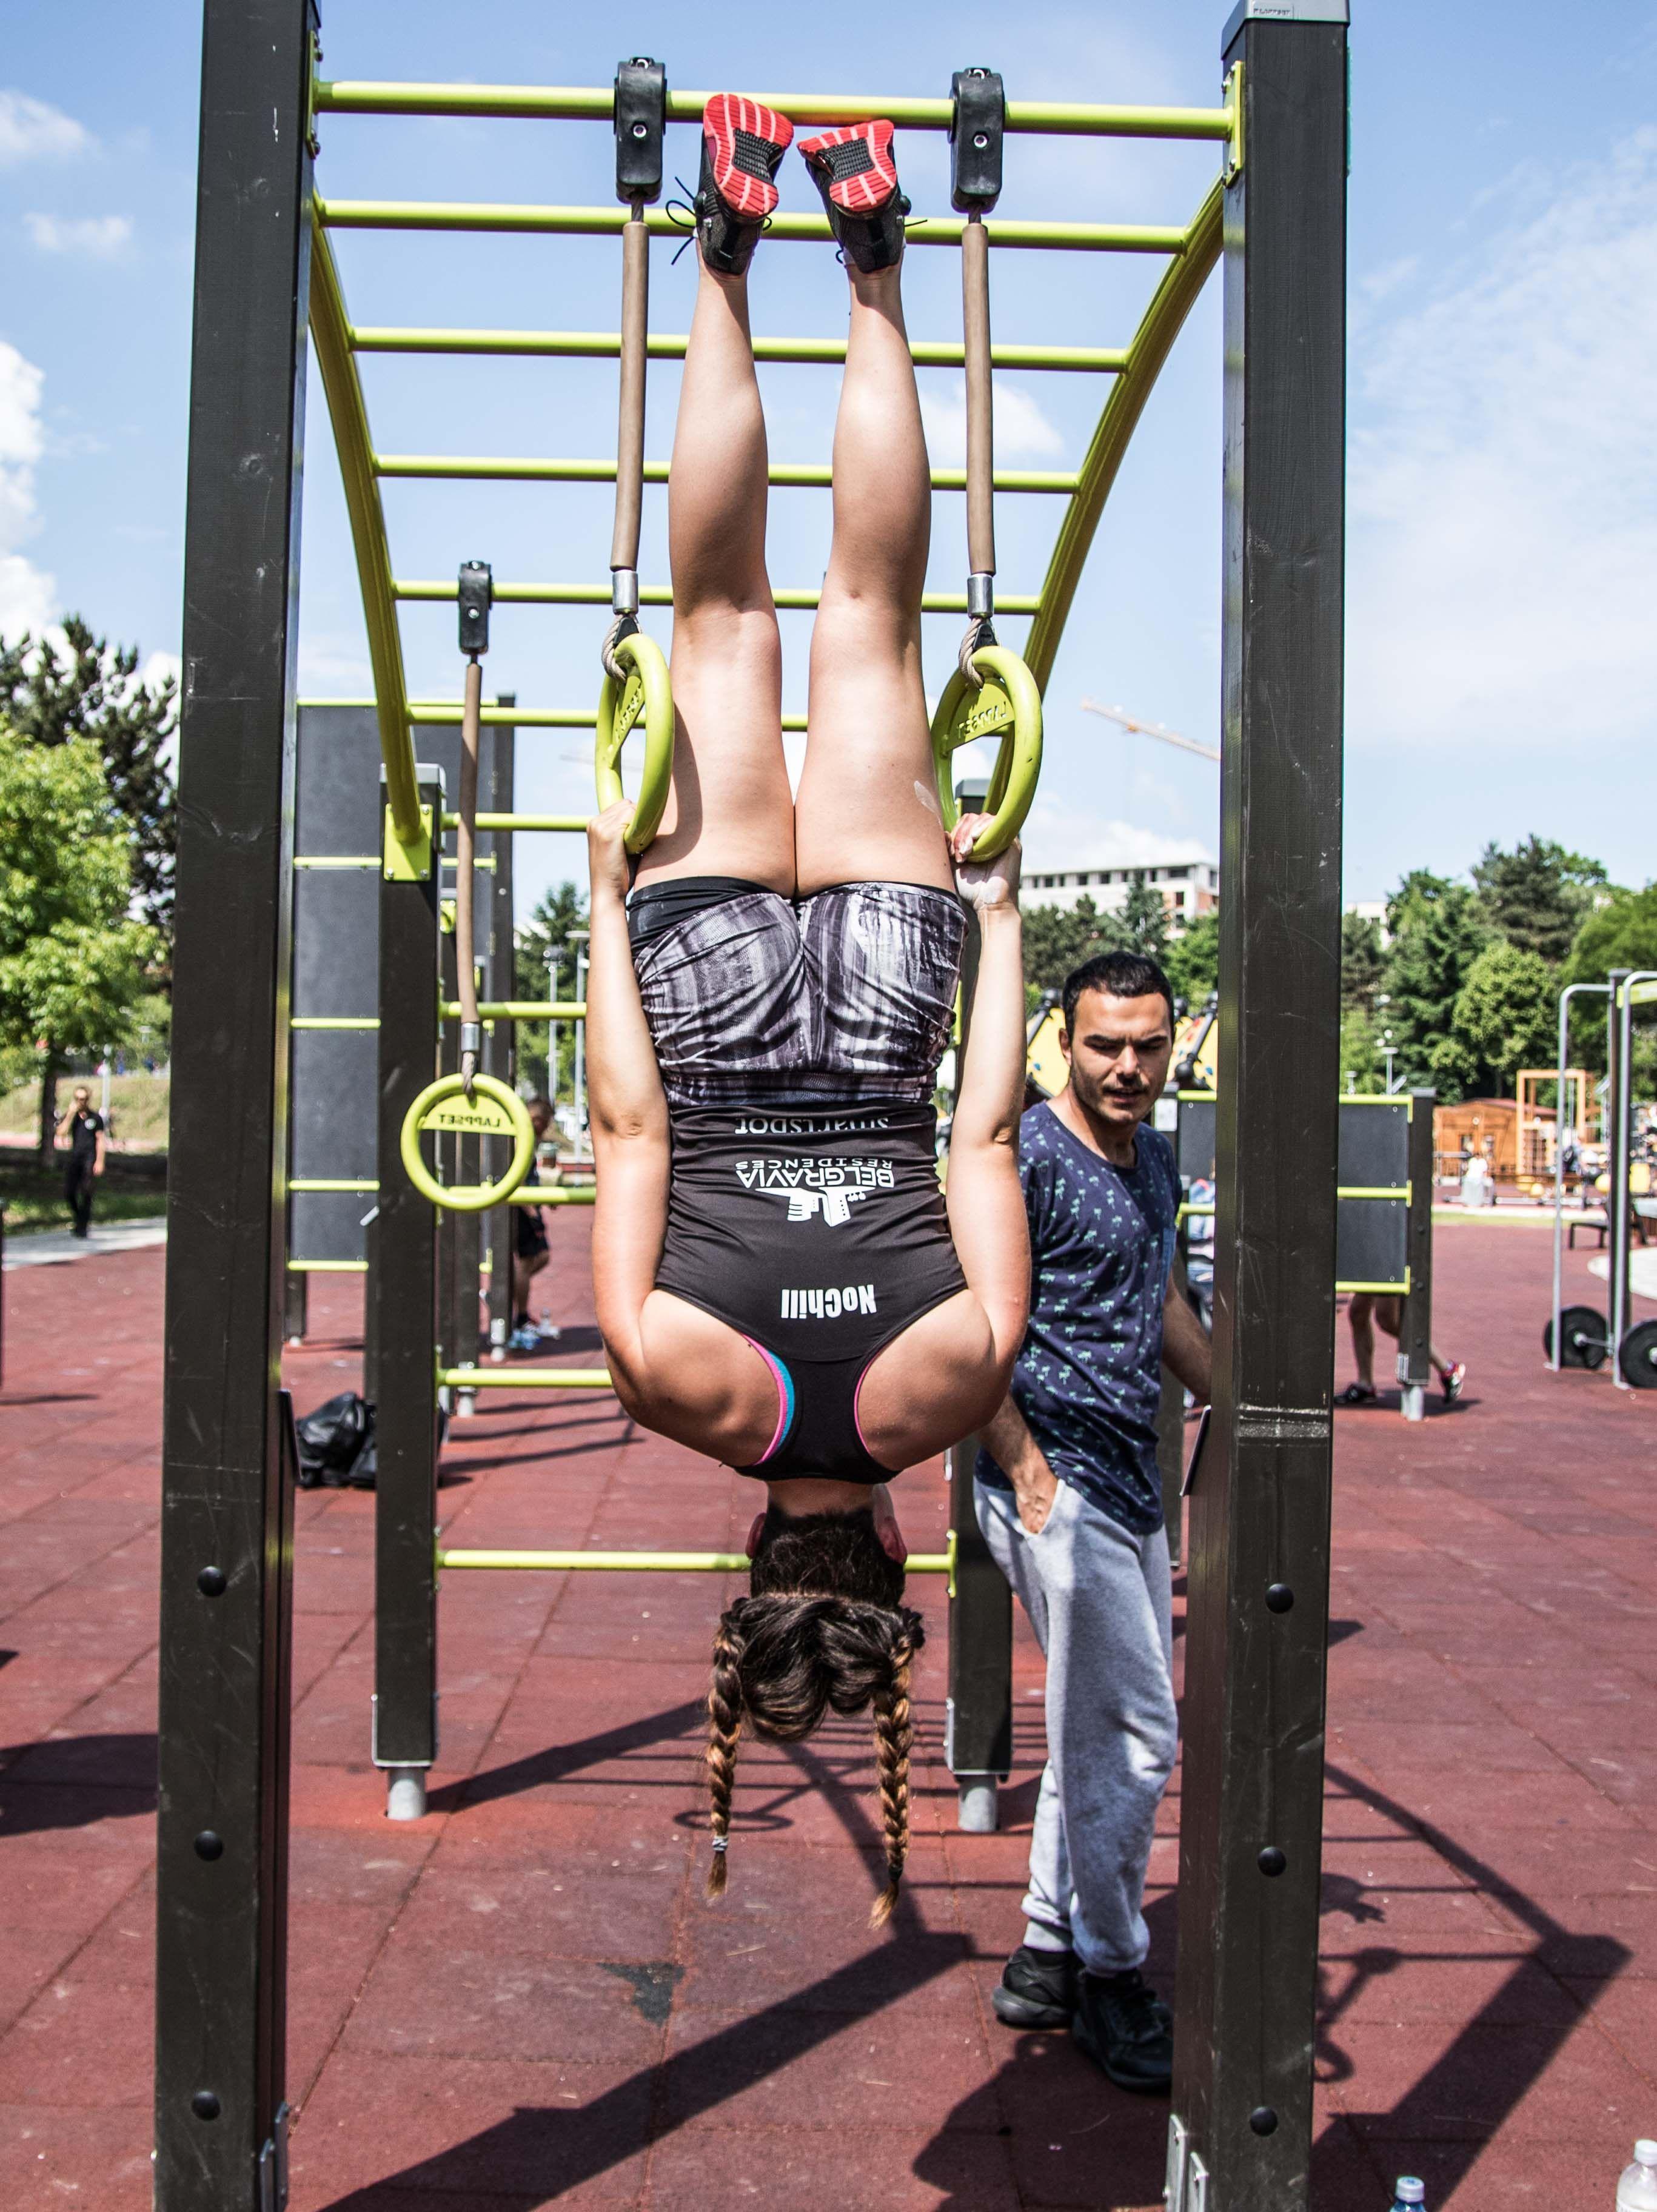 t gym superfit games